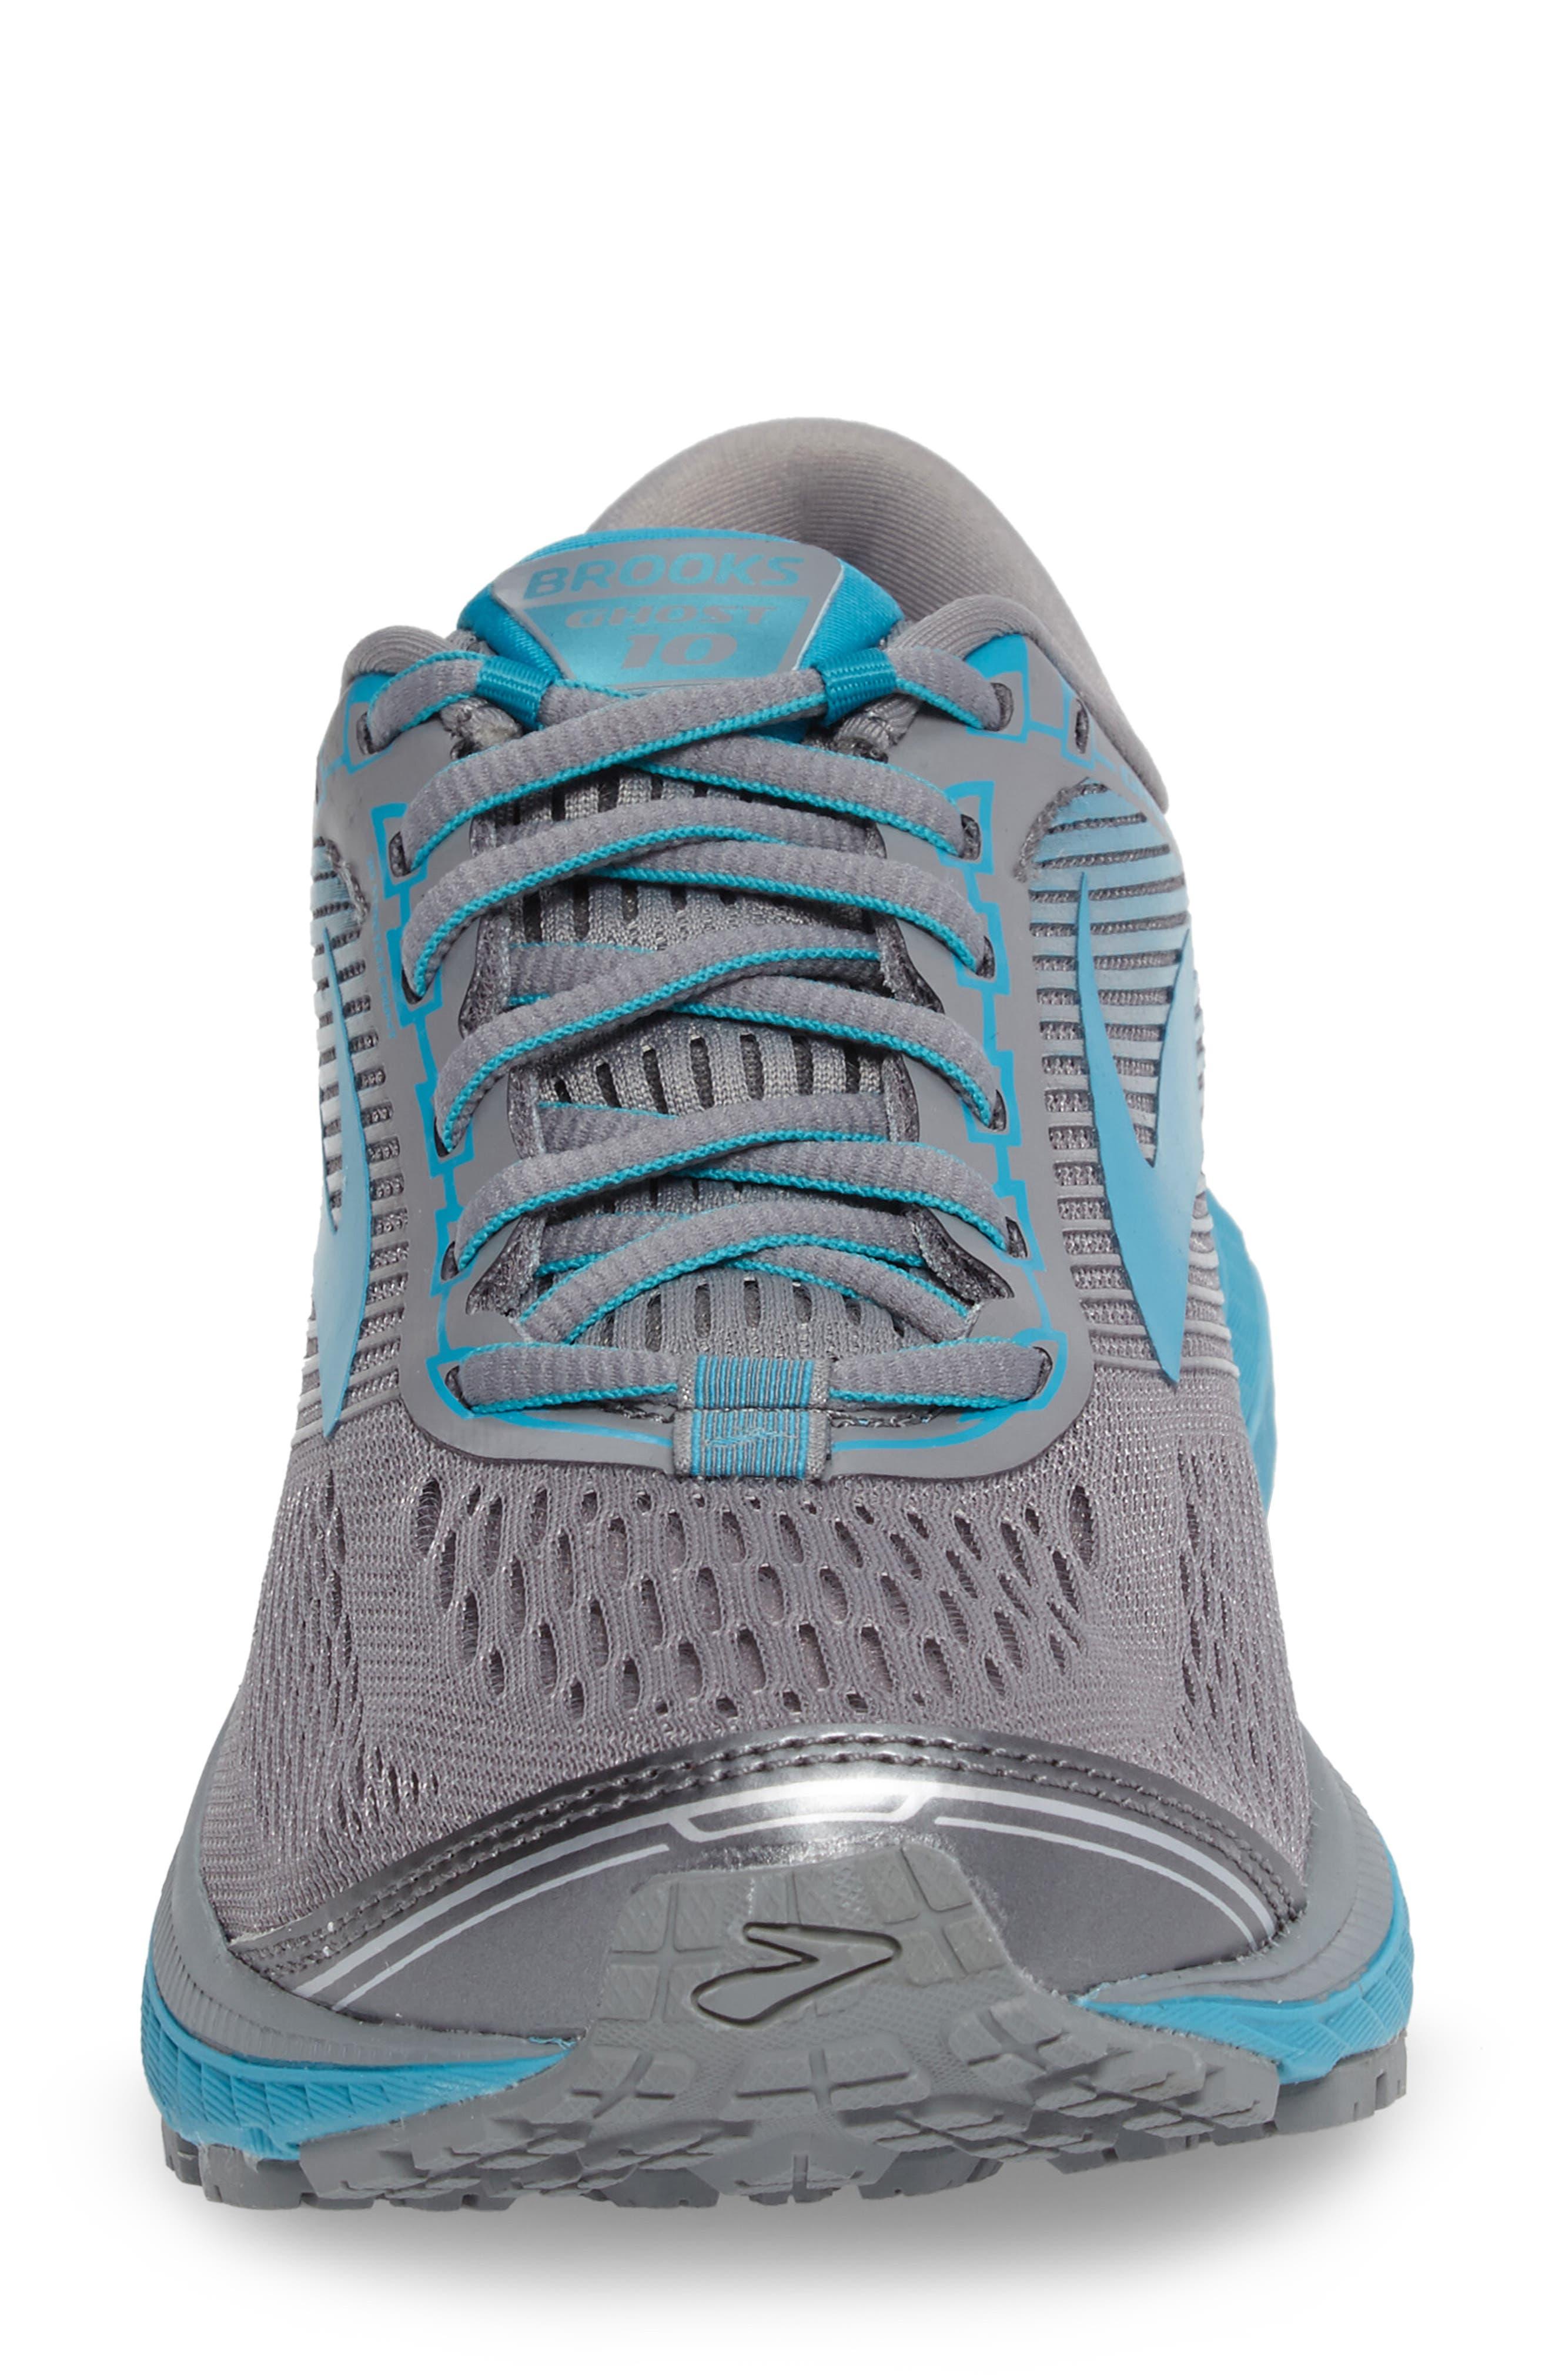 Ghost 10 Running Shoe,                             Alternate thumbnail 4, color,                             Primer Grey/ Teal/ Silver